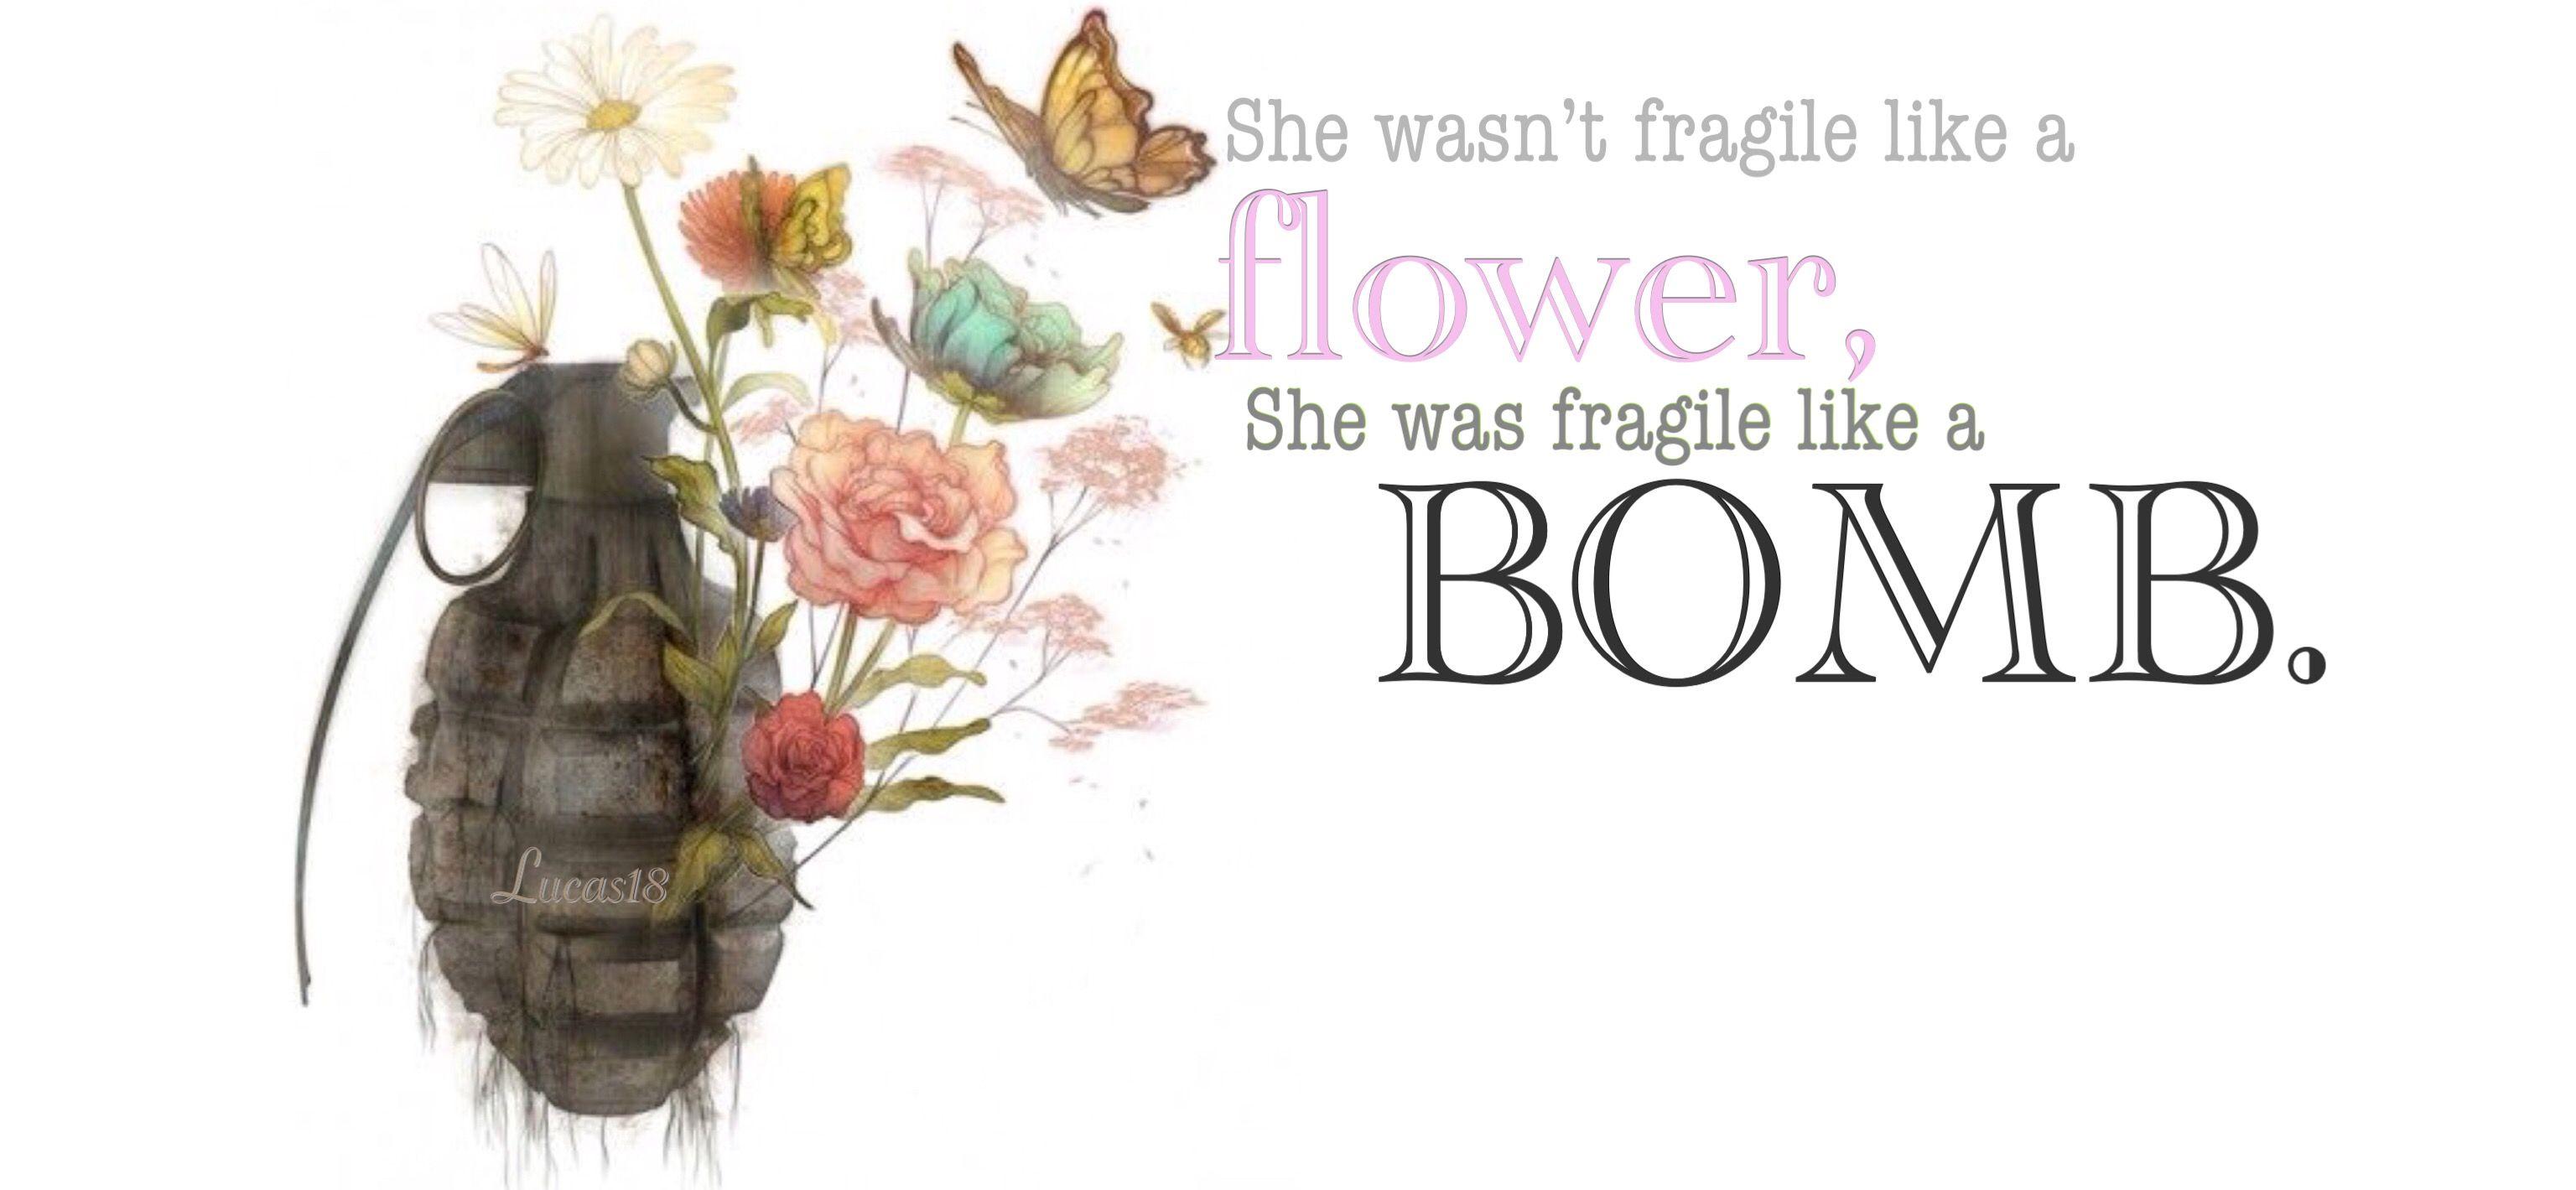 She wasn't fragile like a flower she was fragile like a bomb ...